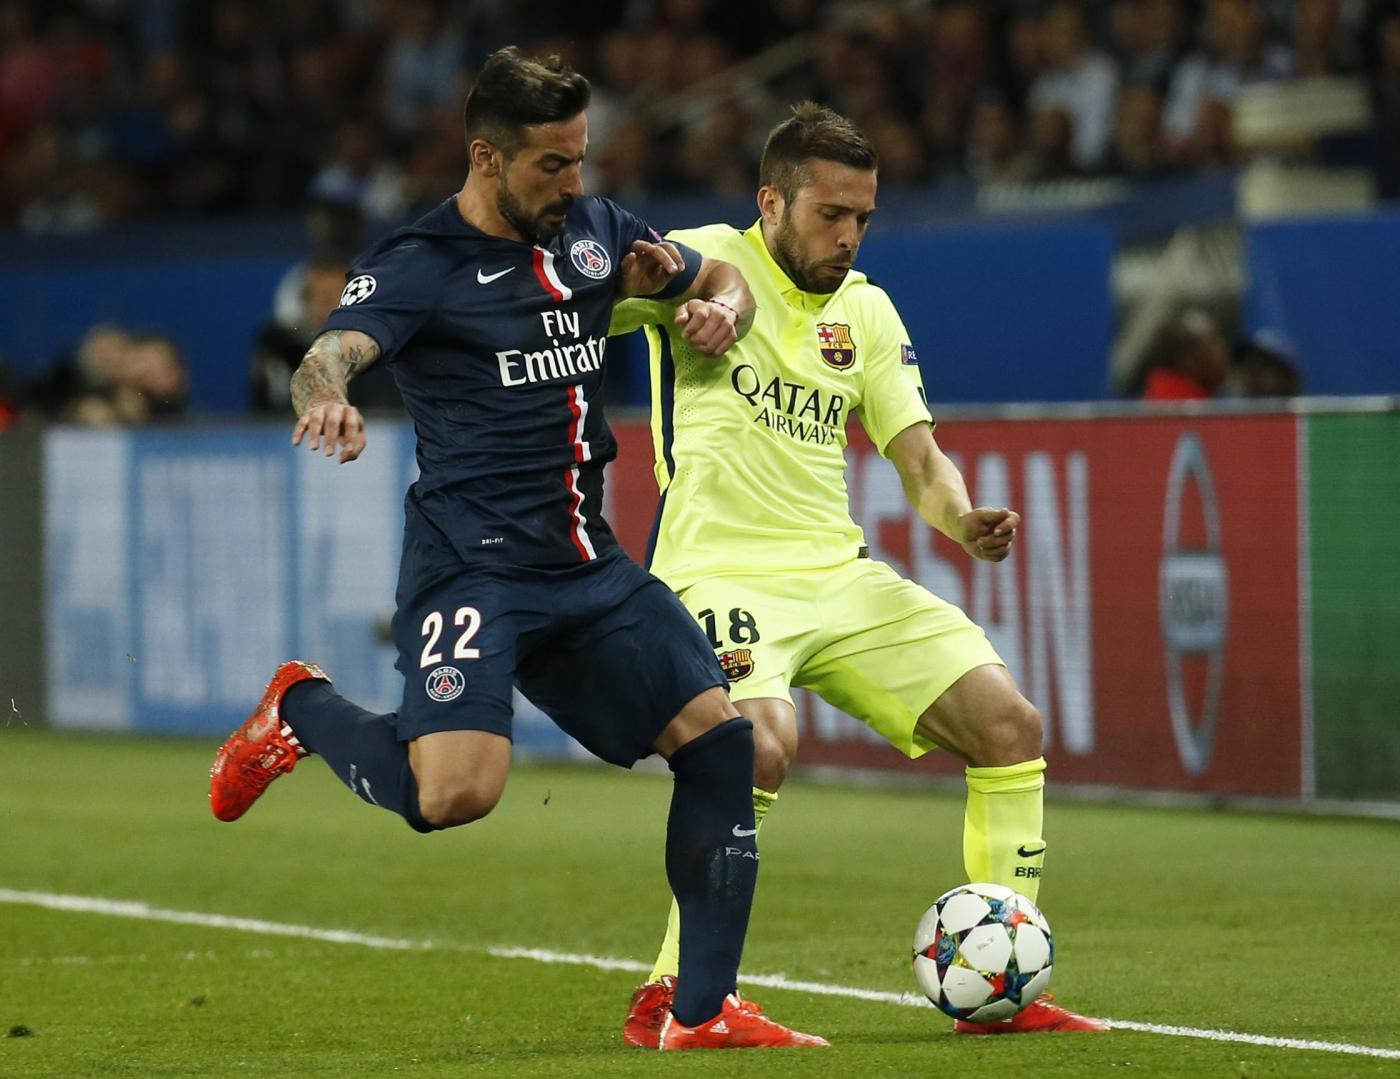 Champions League, Barcellona vs PSG 2-0: passeggiata per i blaugrana